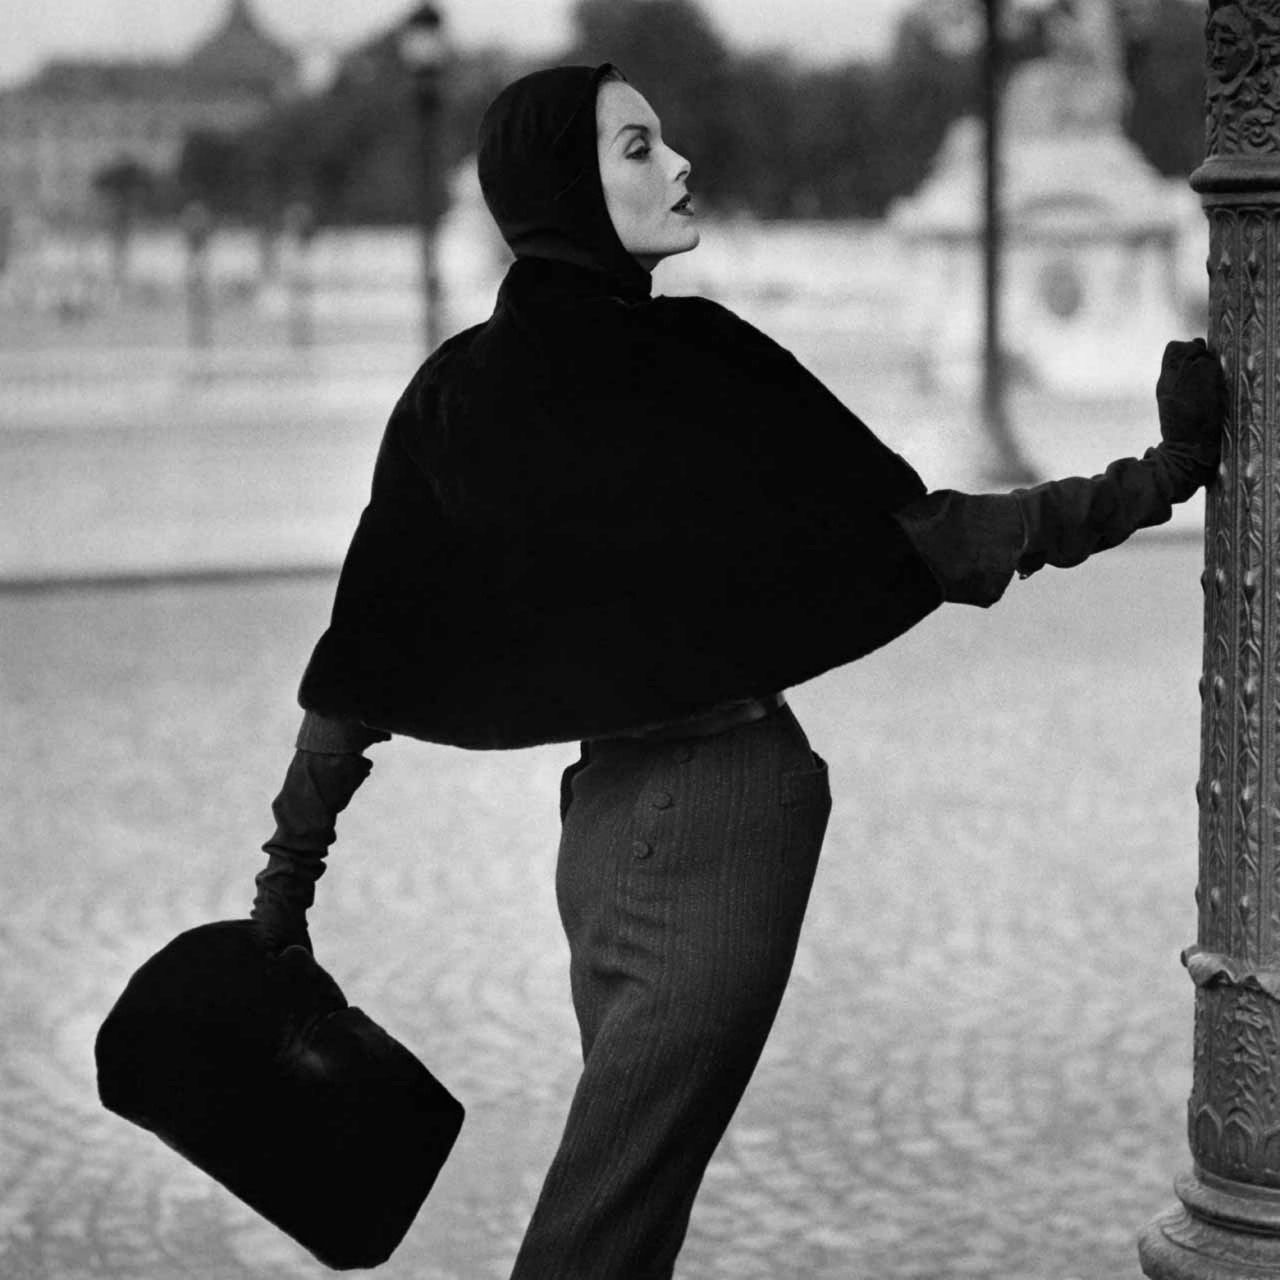 Anne Sainte-Marie in Pierre Balmain Ensemble, photographed by Henry Clarke, 1955